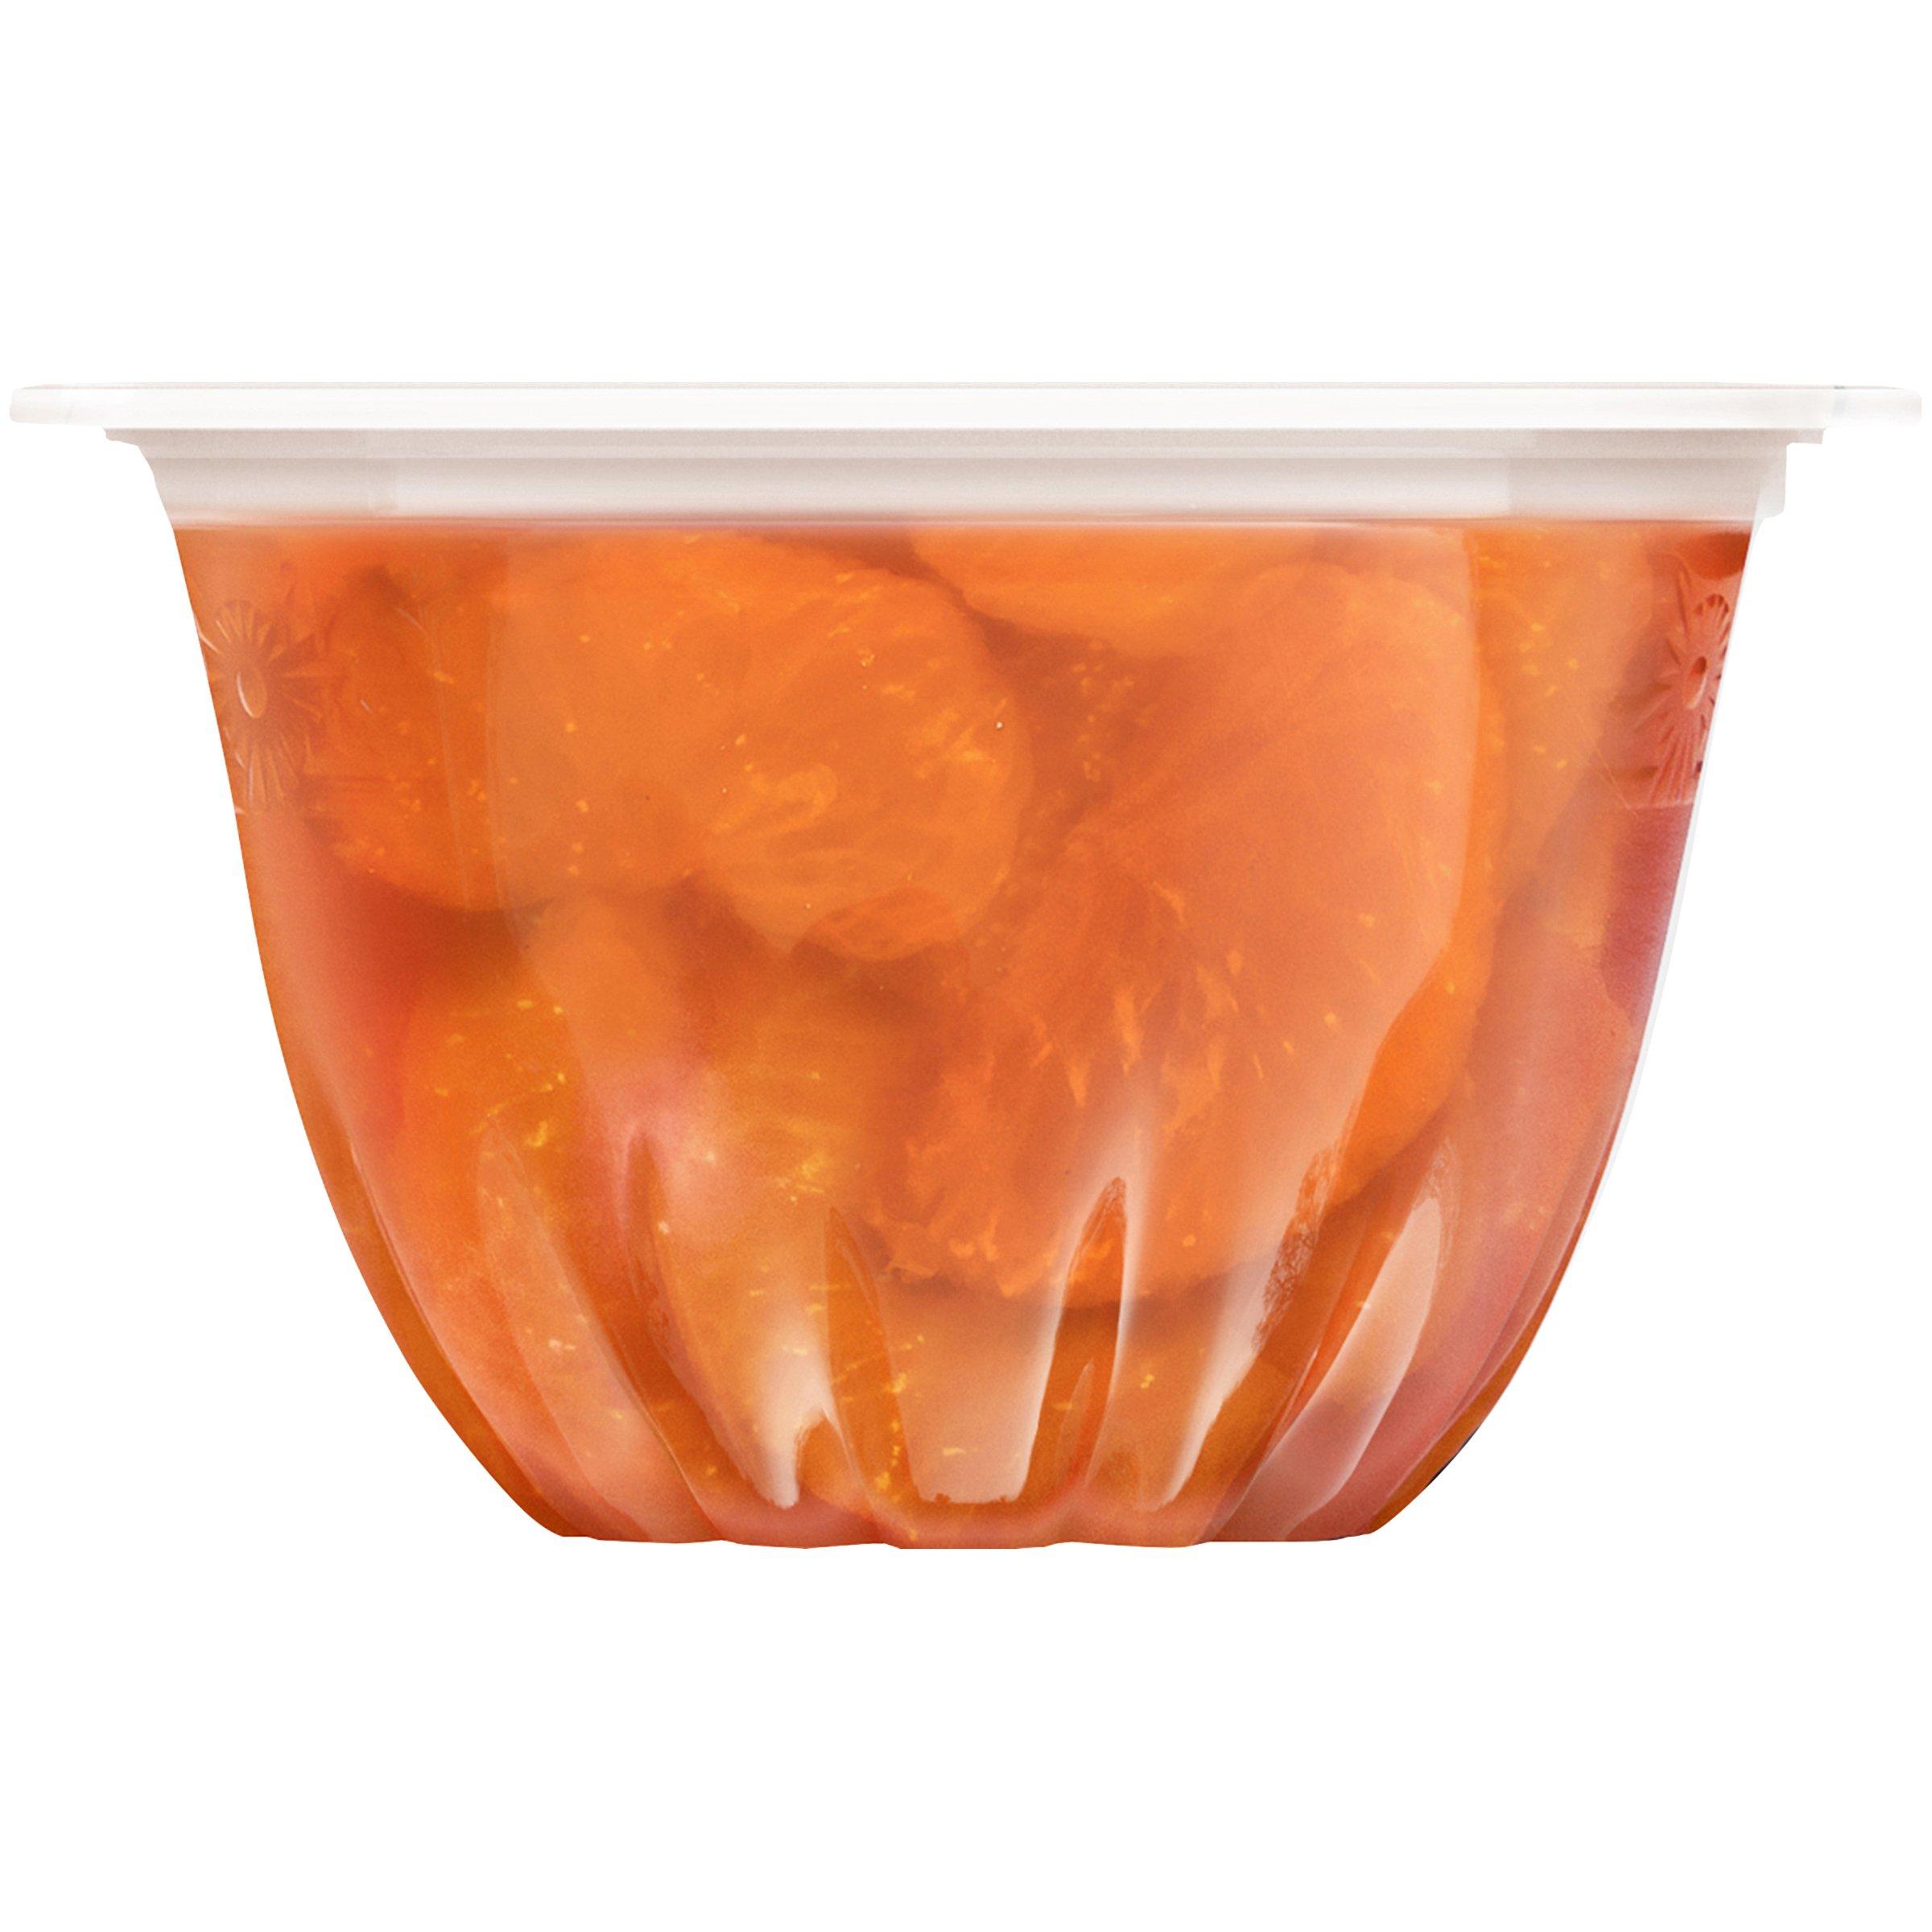 Dole Fruit Bowls, Mandarins in Orange Gel, 4 Cups by Dole Fruit (Image #8)